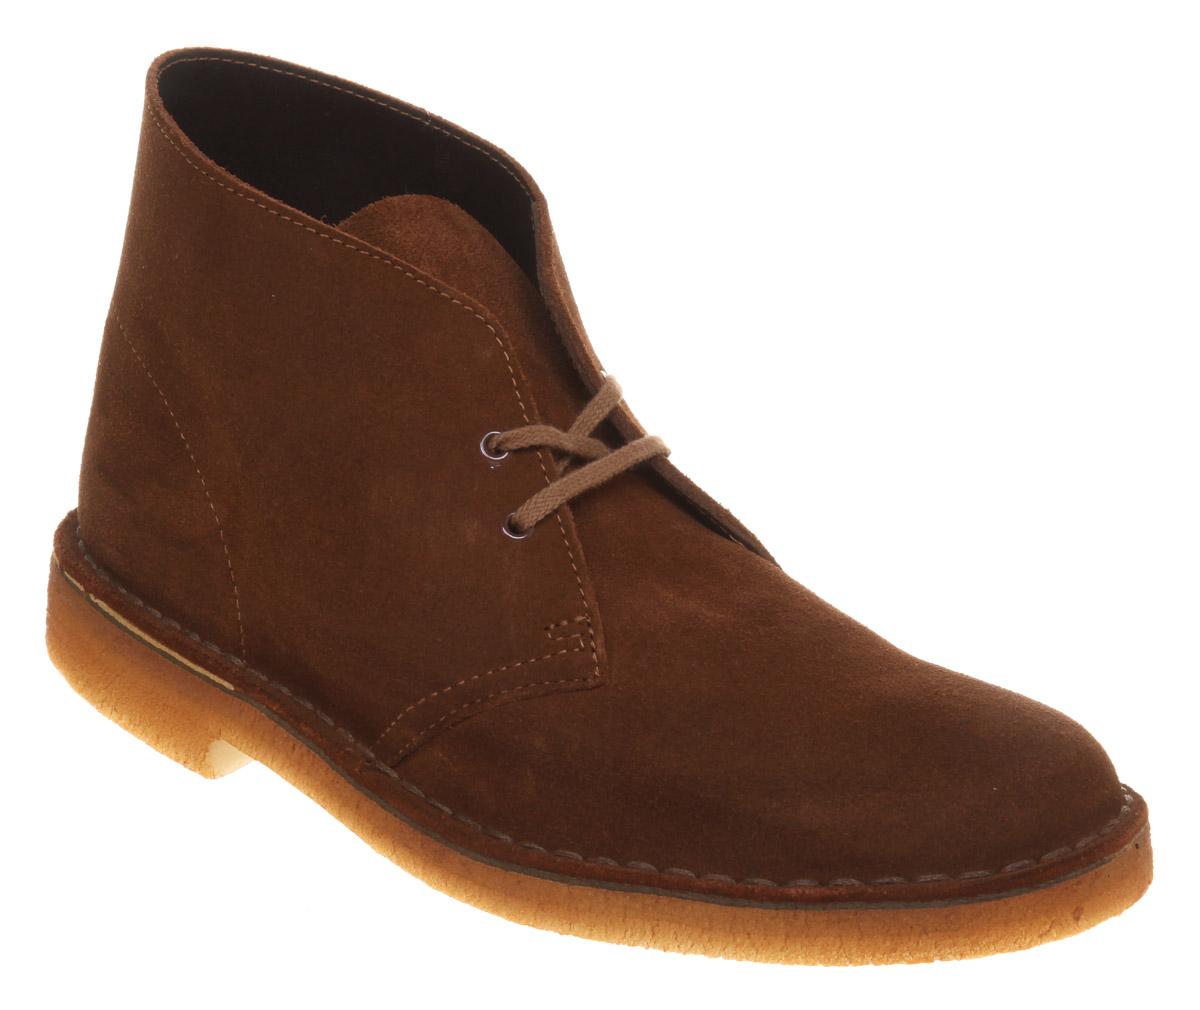 Herren-Clarks-Originals-Desert-Boot-Cola-Wildleder-Stiefel Indexbild 2